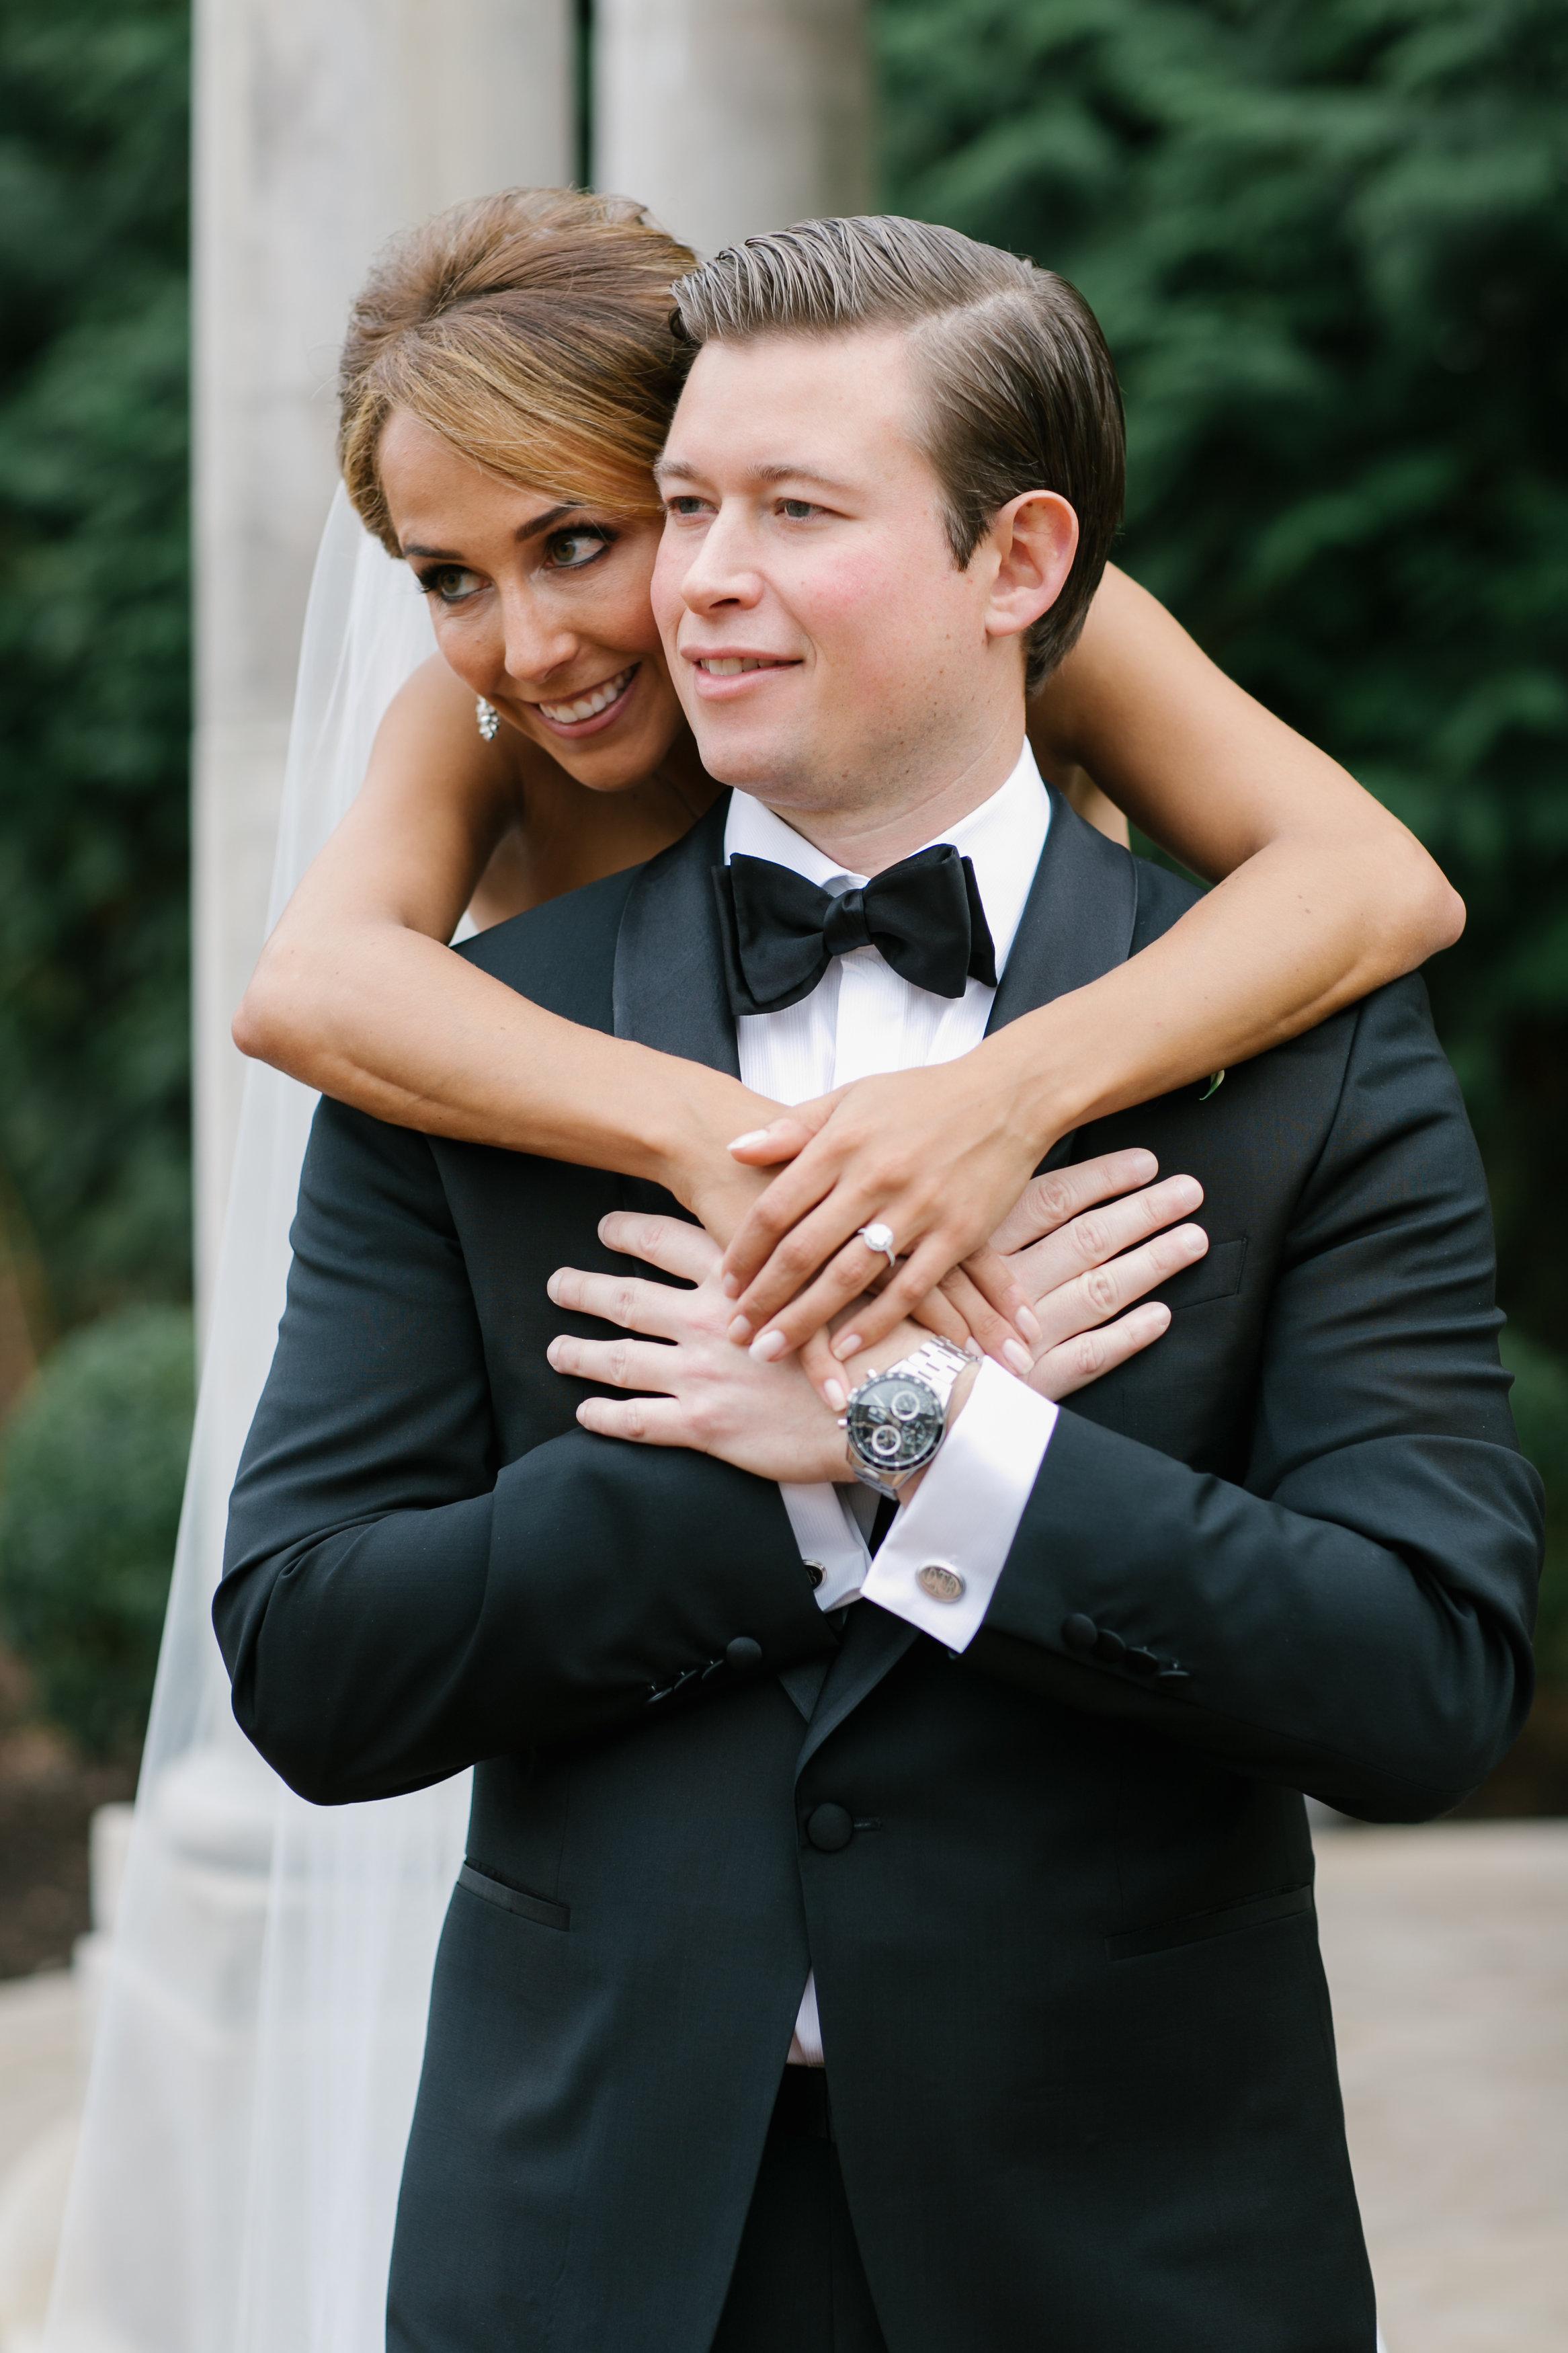 Ceci_New_York_Custom_Invitation_ New_Jersey_Wedding_Luxury_Personalized_Ceci_Style_Bride_Foil_Stamping28.jpg